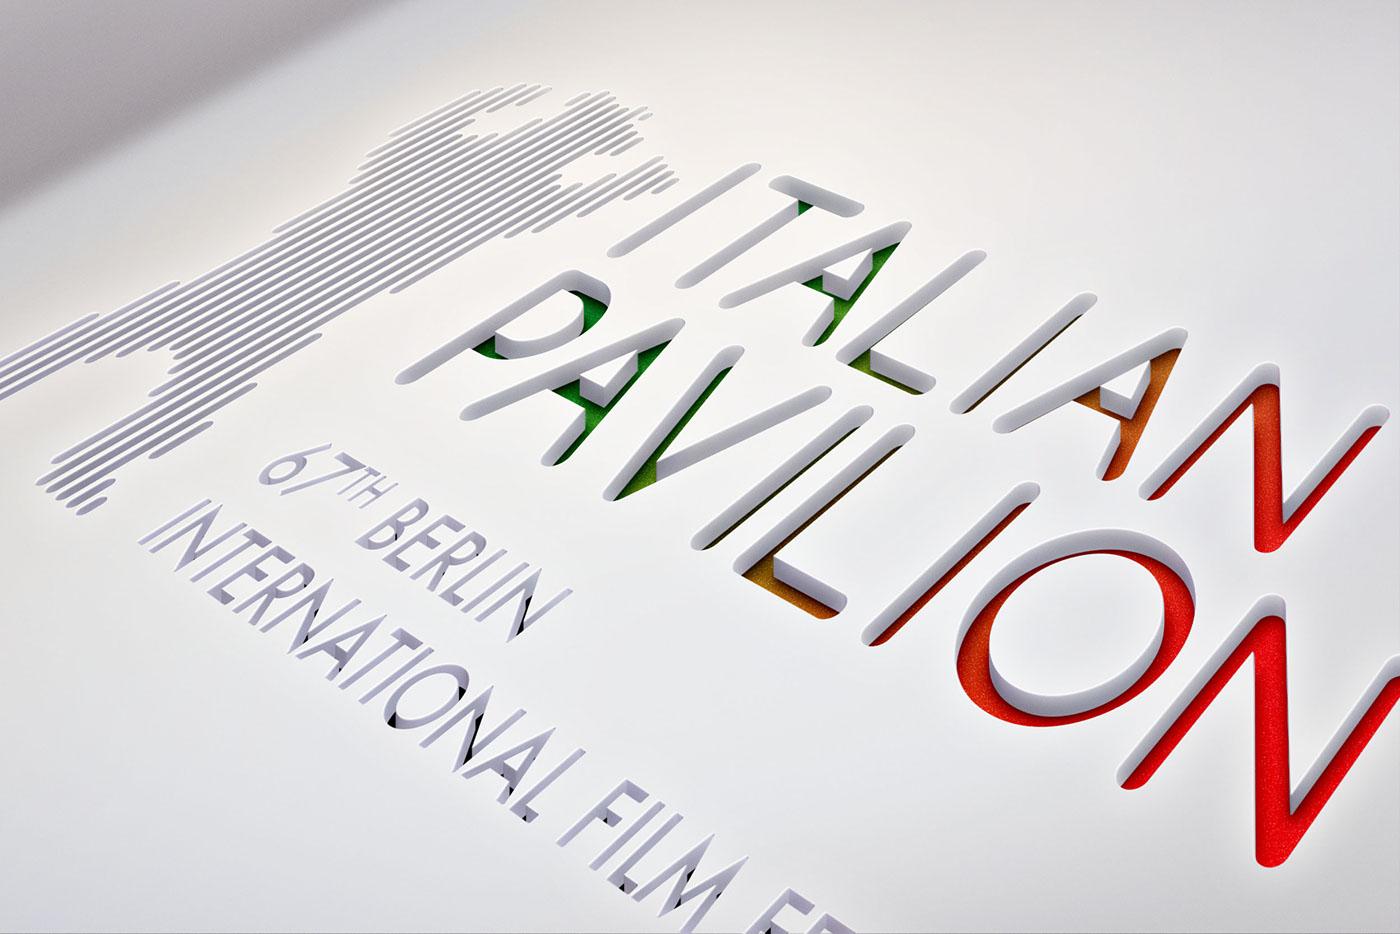 67TH BERLIN INTERNATIONAL FILM FESTIVAL LOGO DESIGN